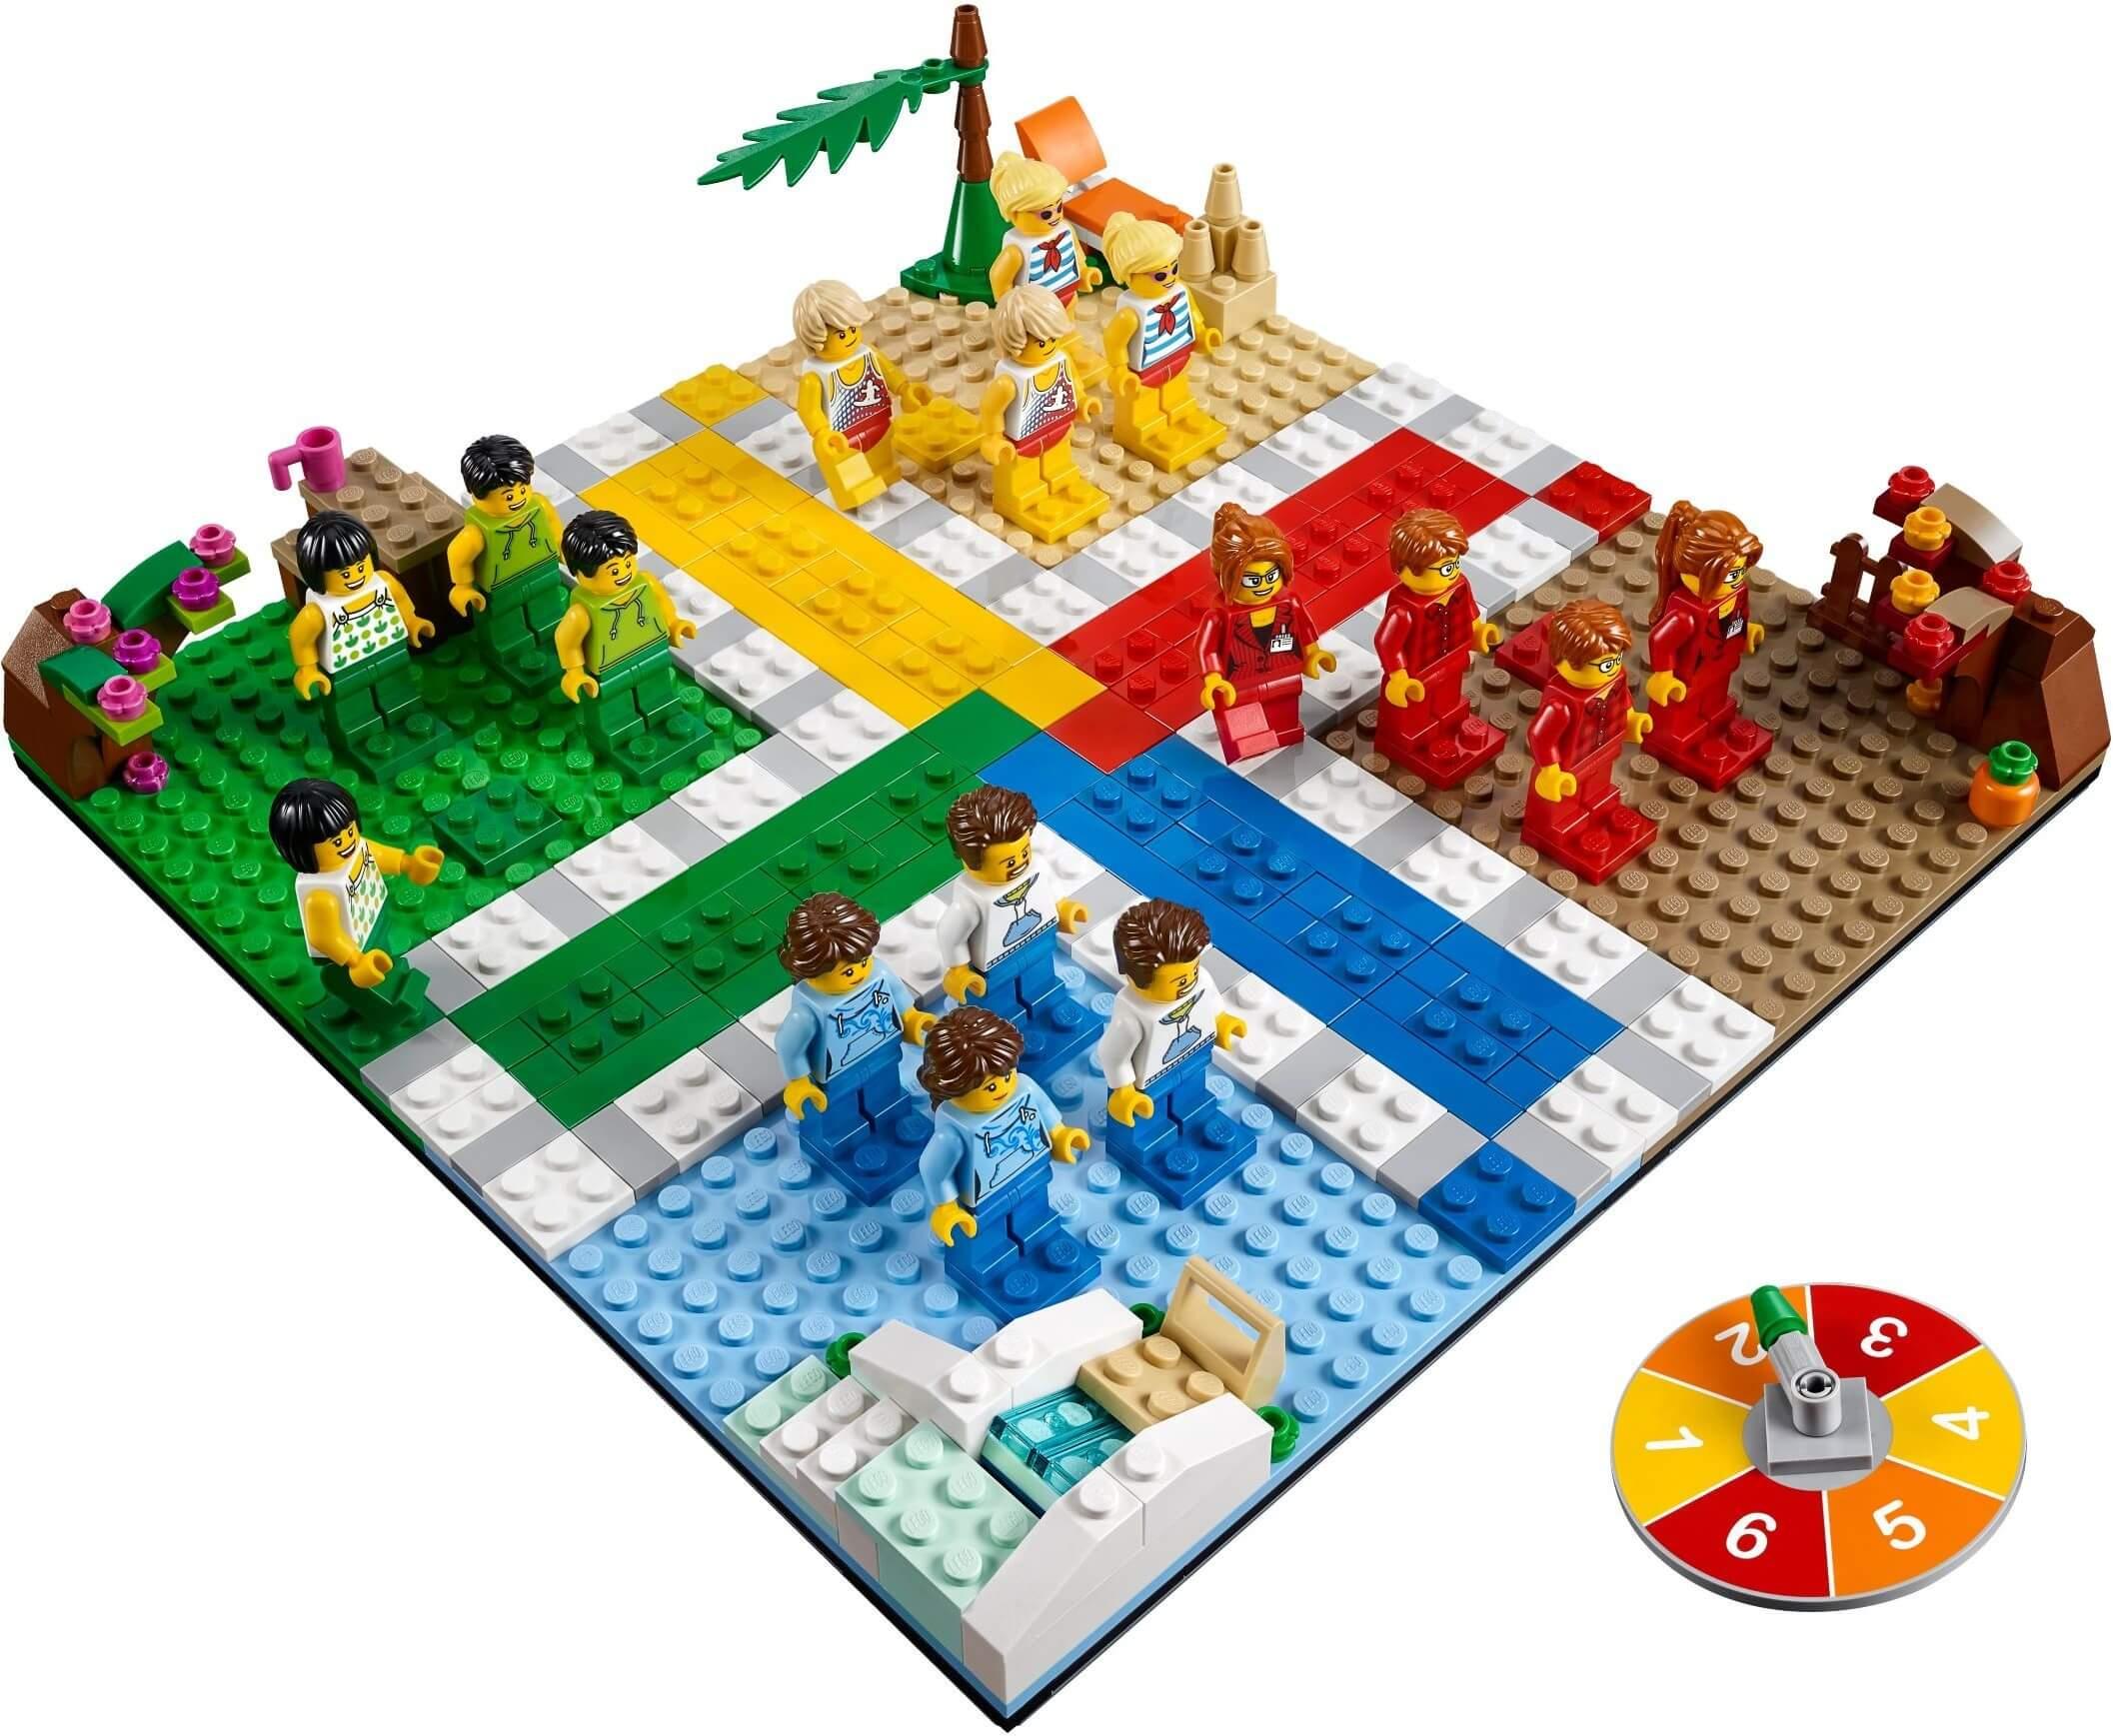 Mua đồ chơi LEGO 40198 - LEGO Ideas 40198 - Cờ Cá Ngựa LEGO Ludo Game (LEGO 40198 LEGO Ludo Game)